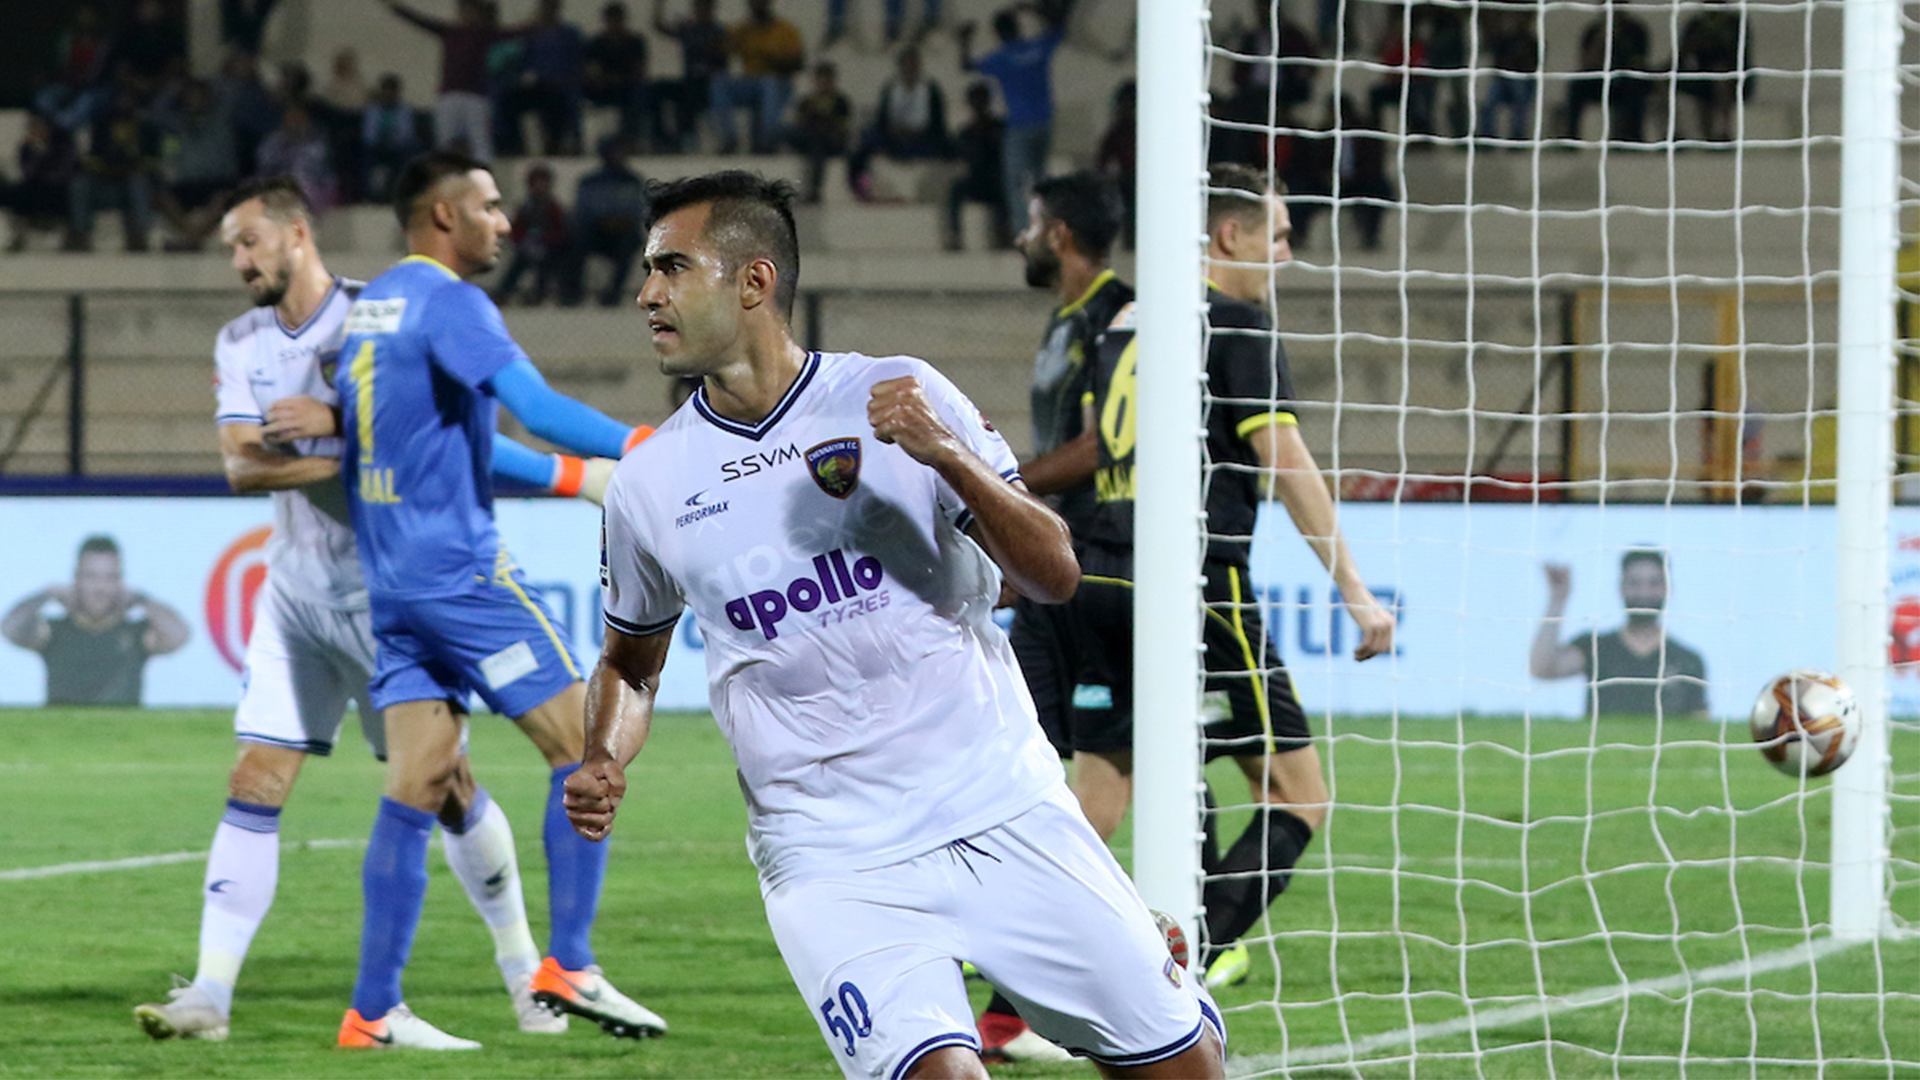 'The best goal of my career' - Chennaiyin FC's Rafael Crivellaro on his wonderstrike against NorthEast United FC